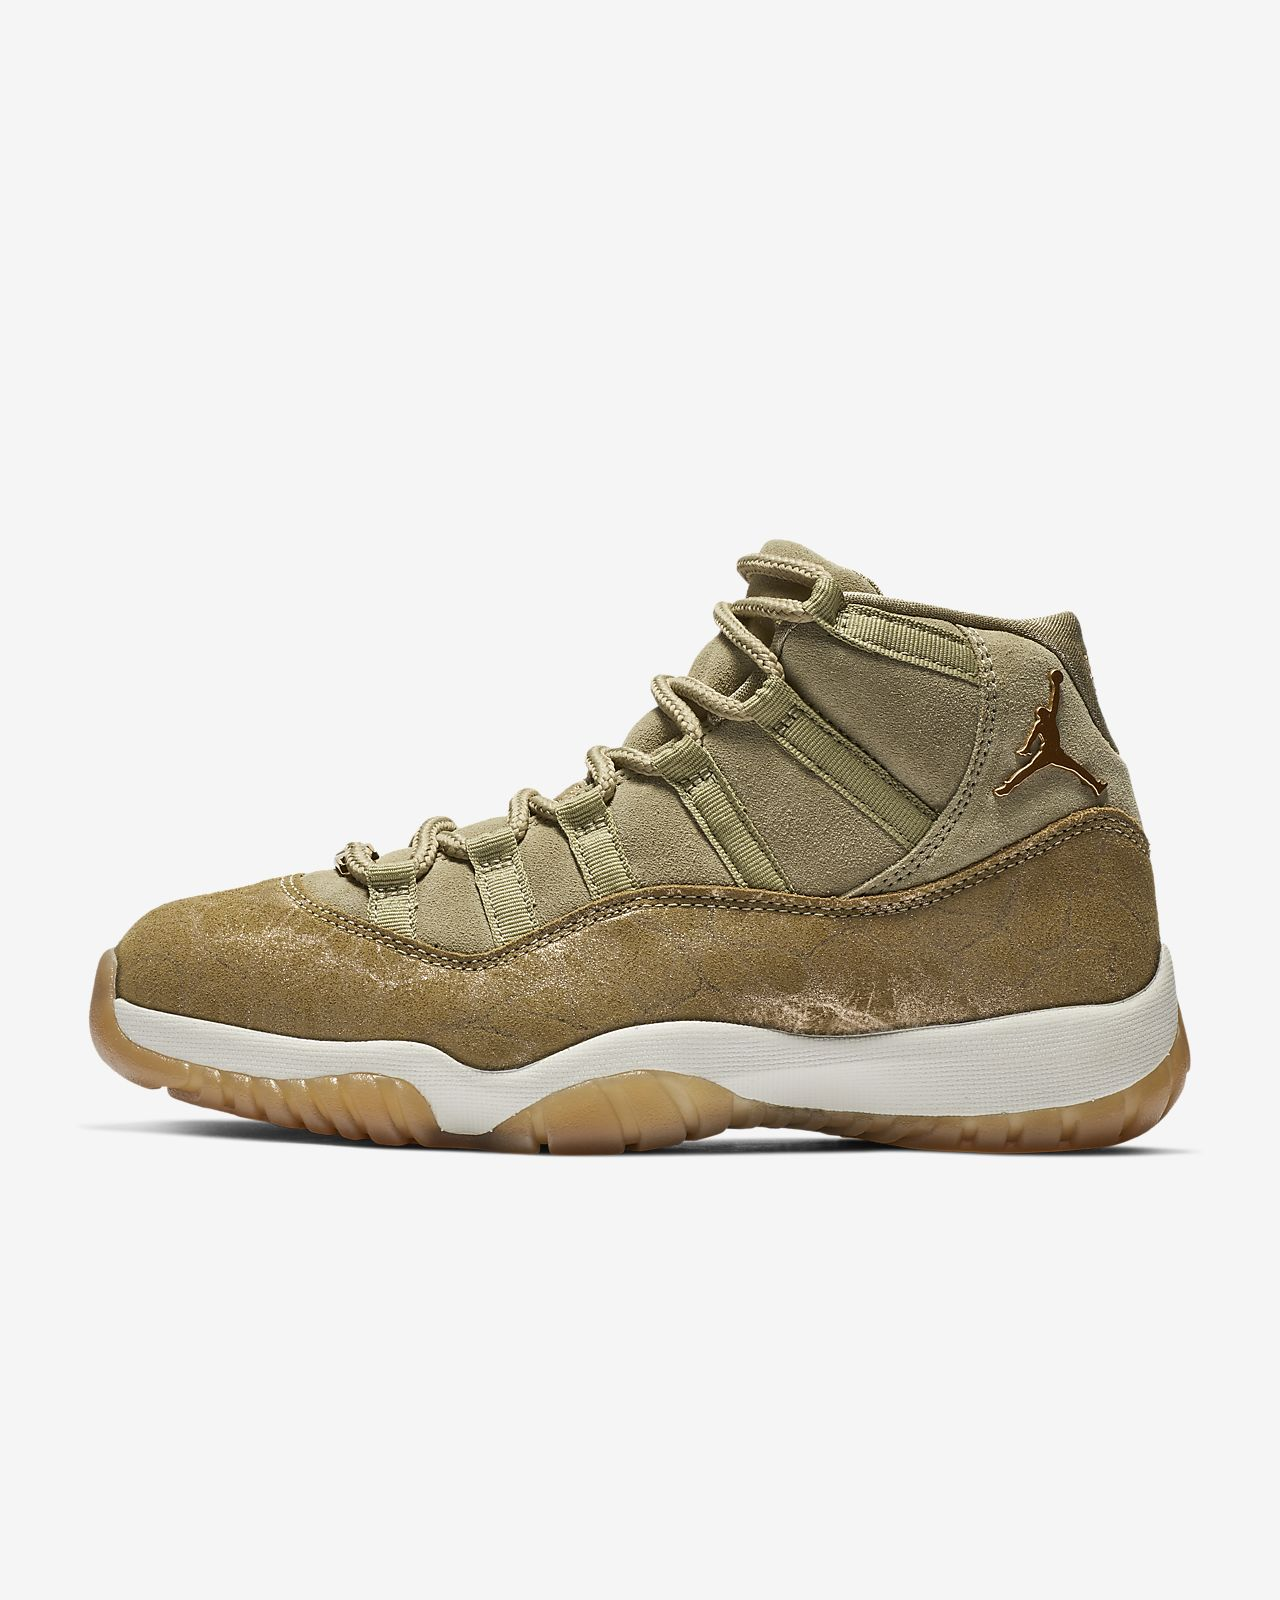 Air Jordan 11 Retro Women's Shoe